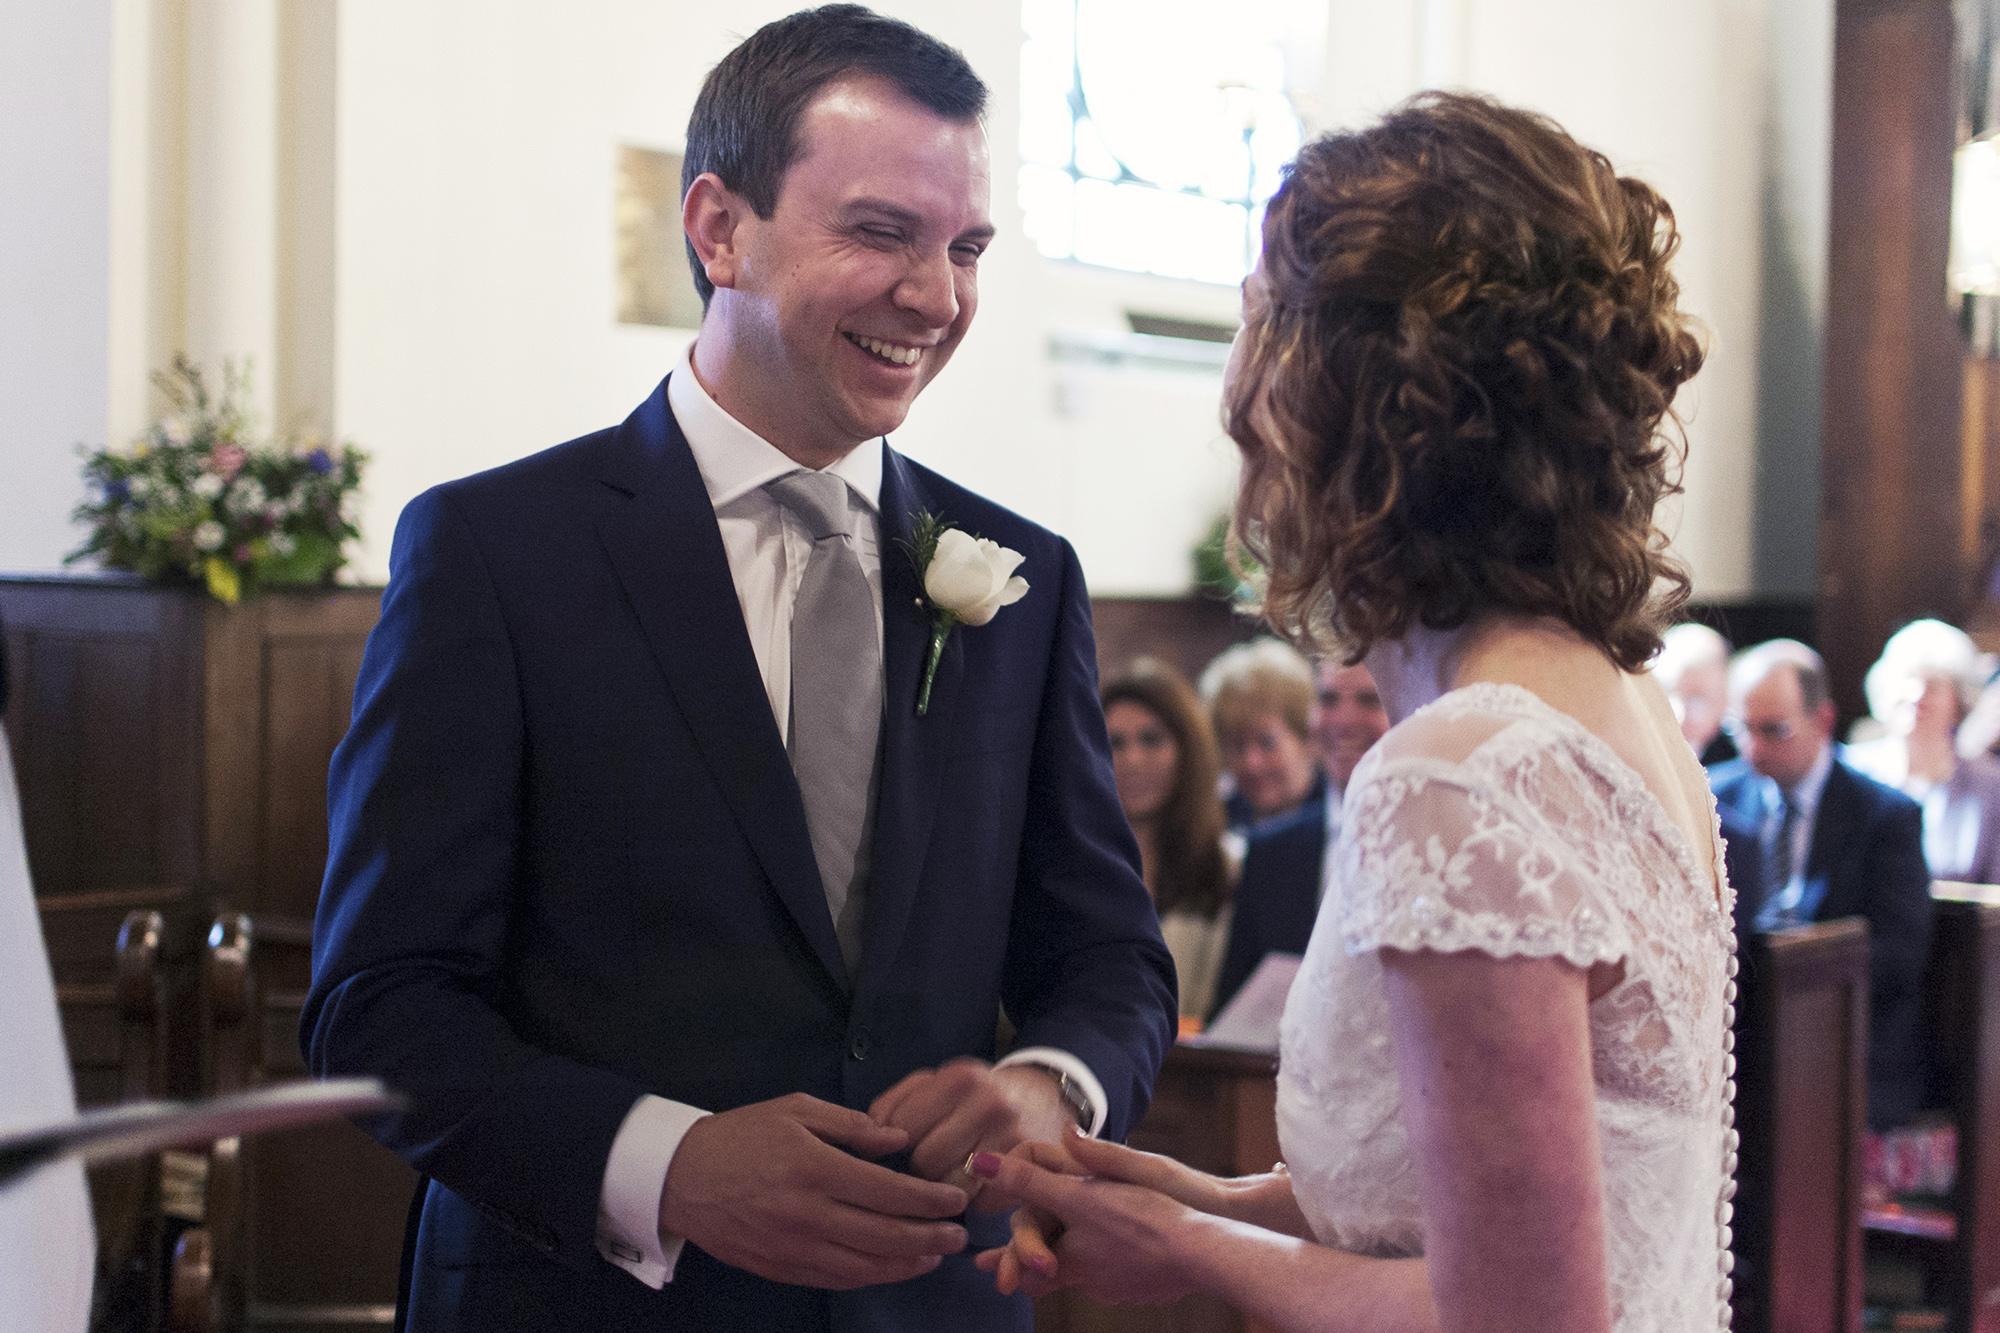 Gerry_Jon_Wedding_044